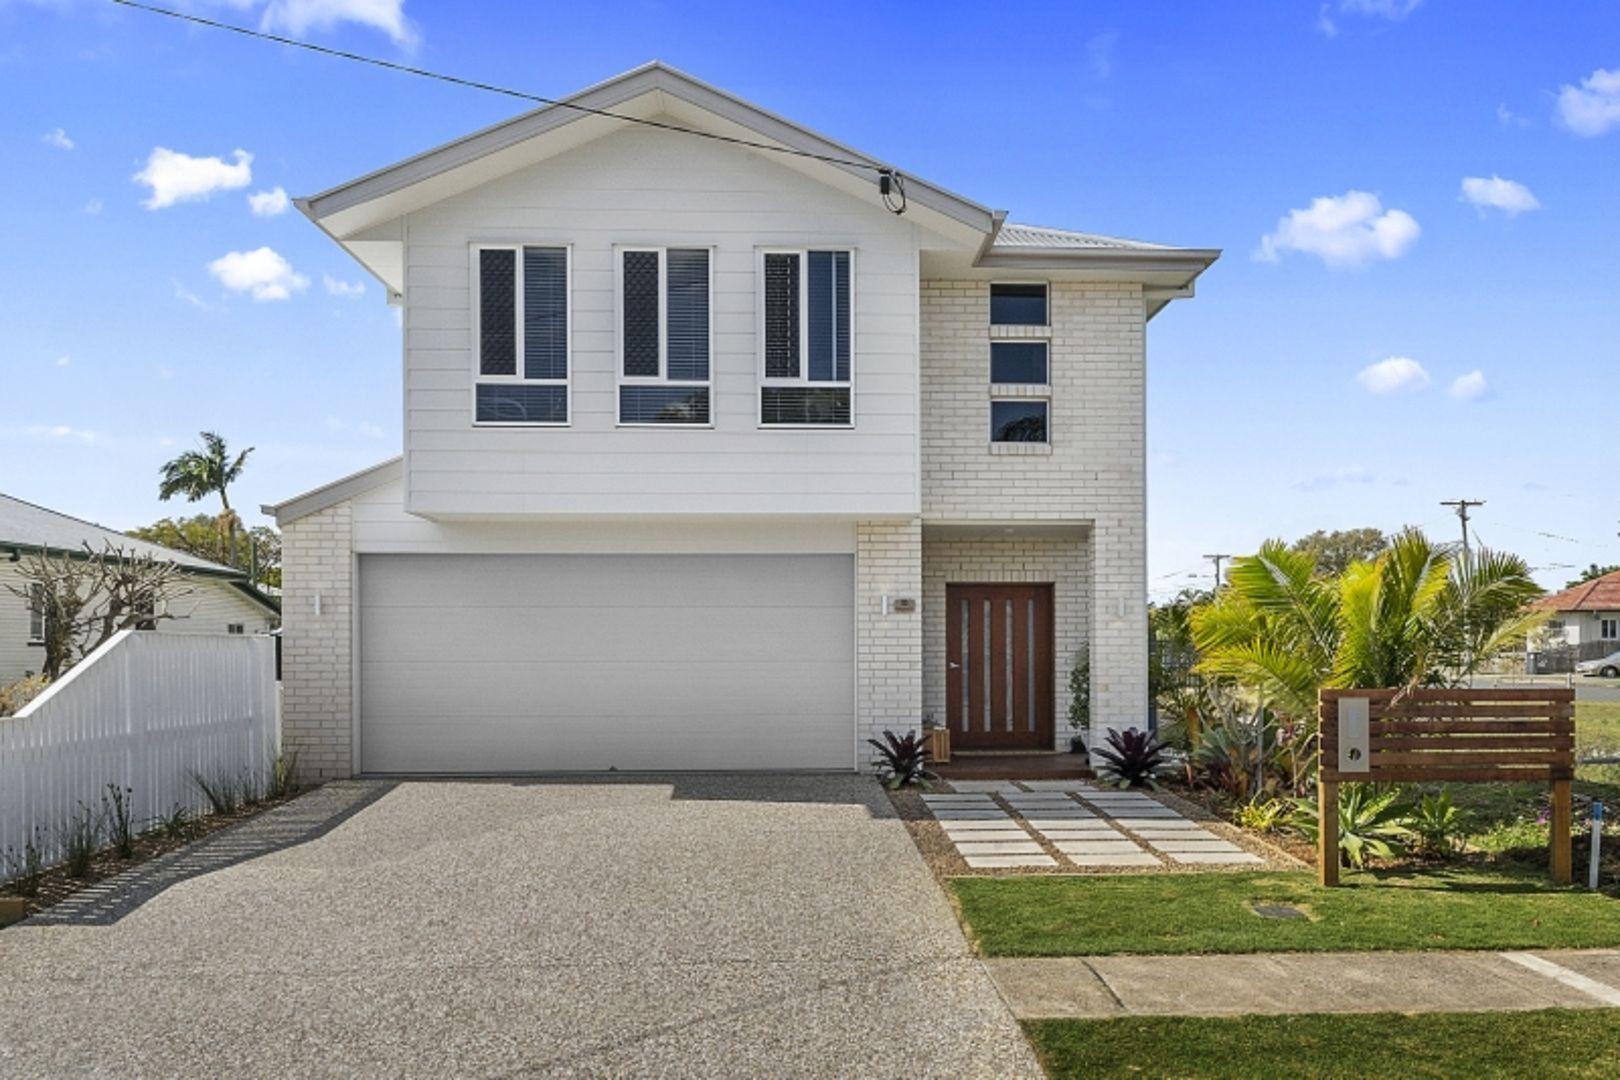 95 Bungama St, Deagon QLD 4017, Image 0